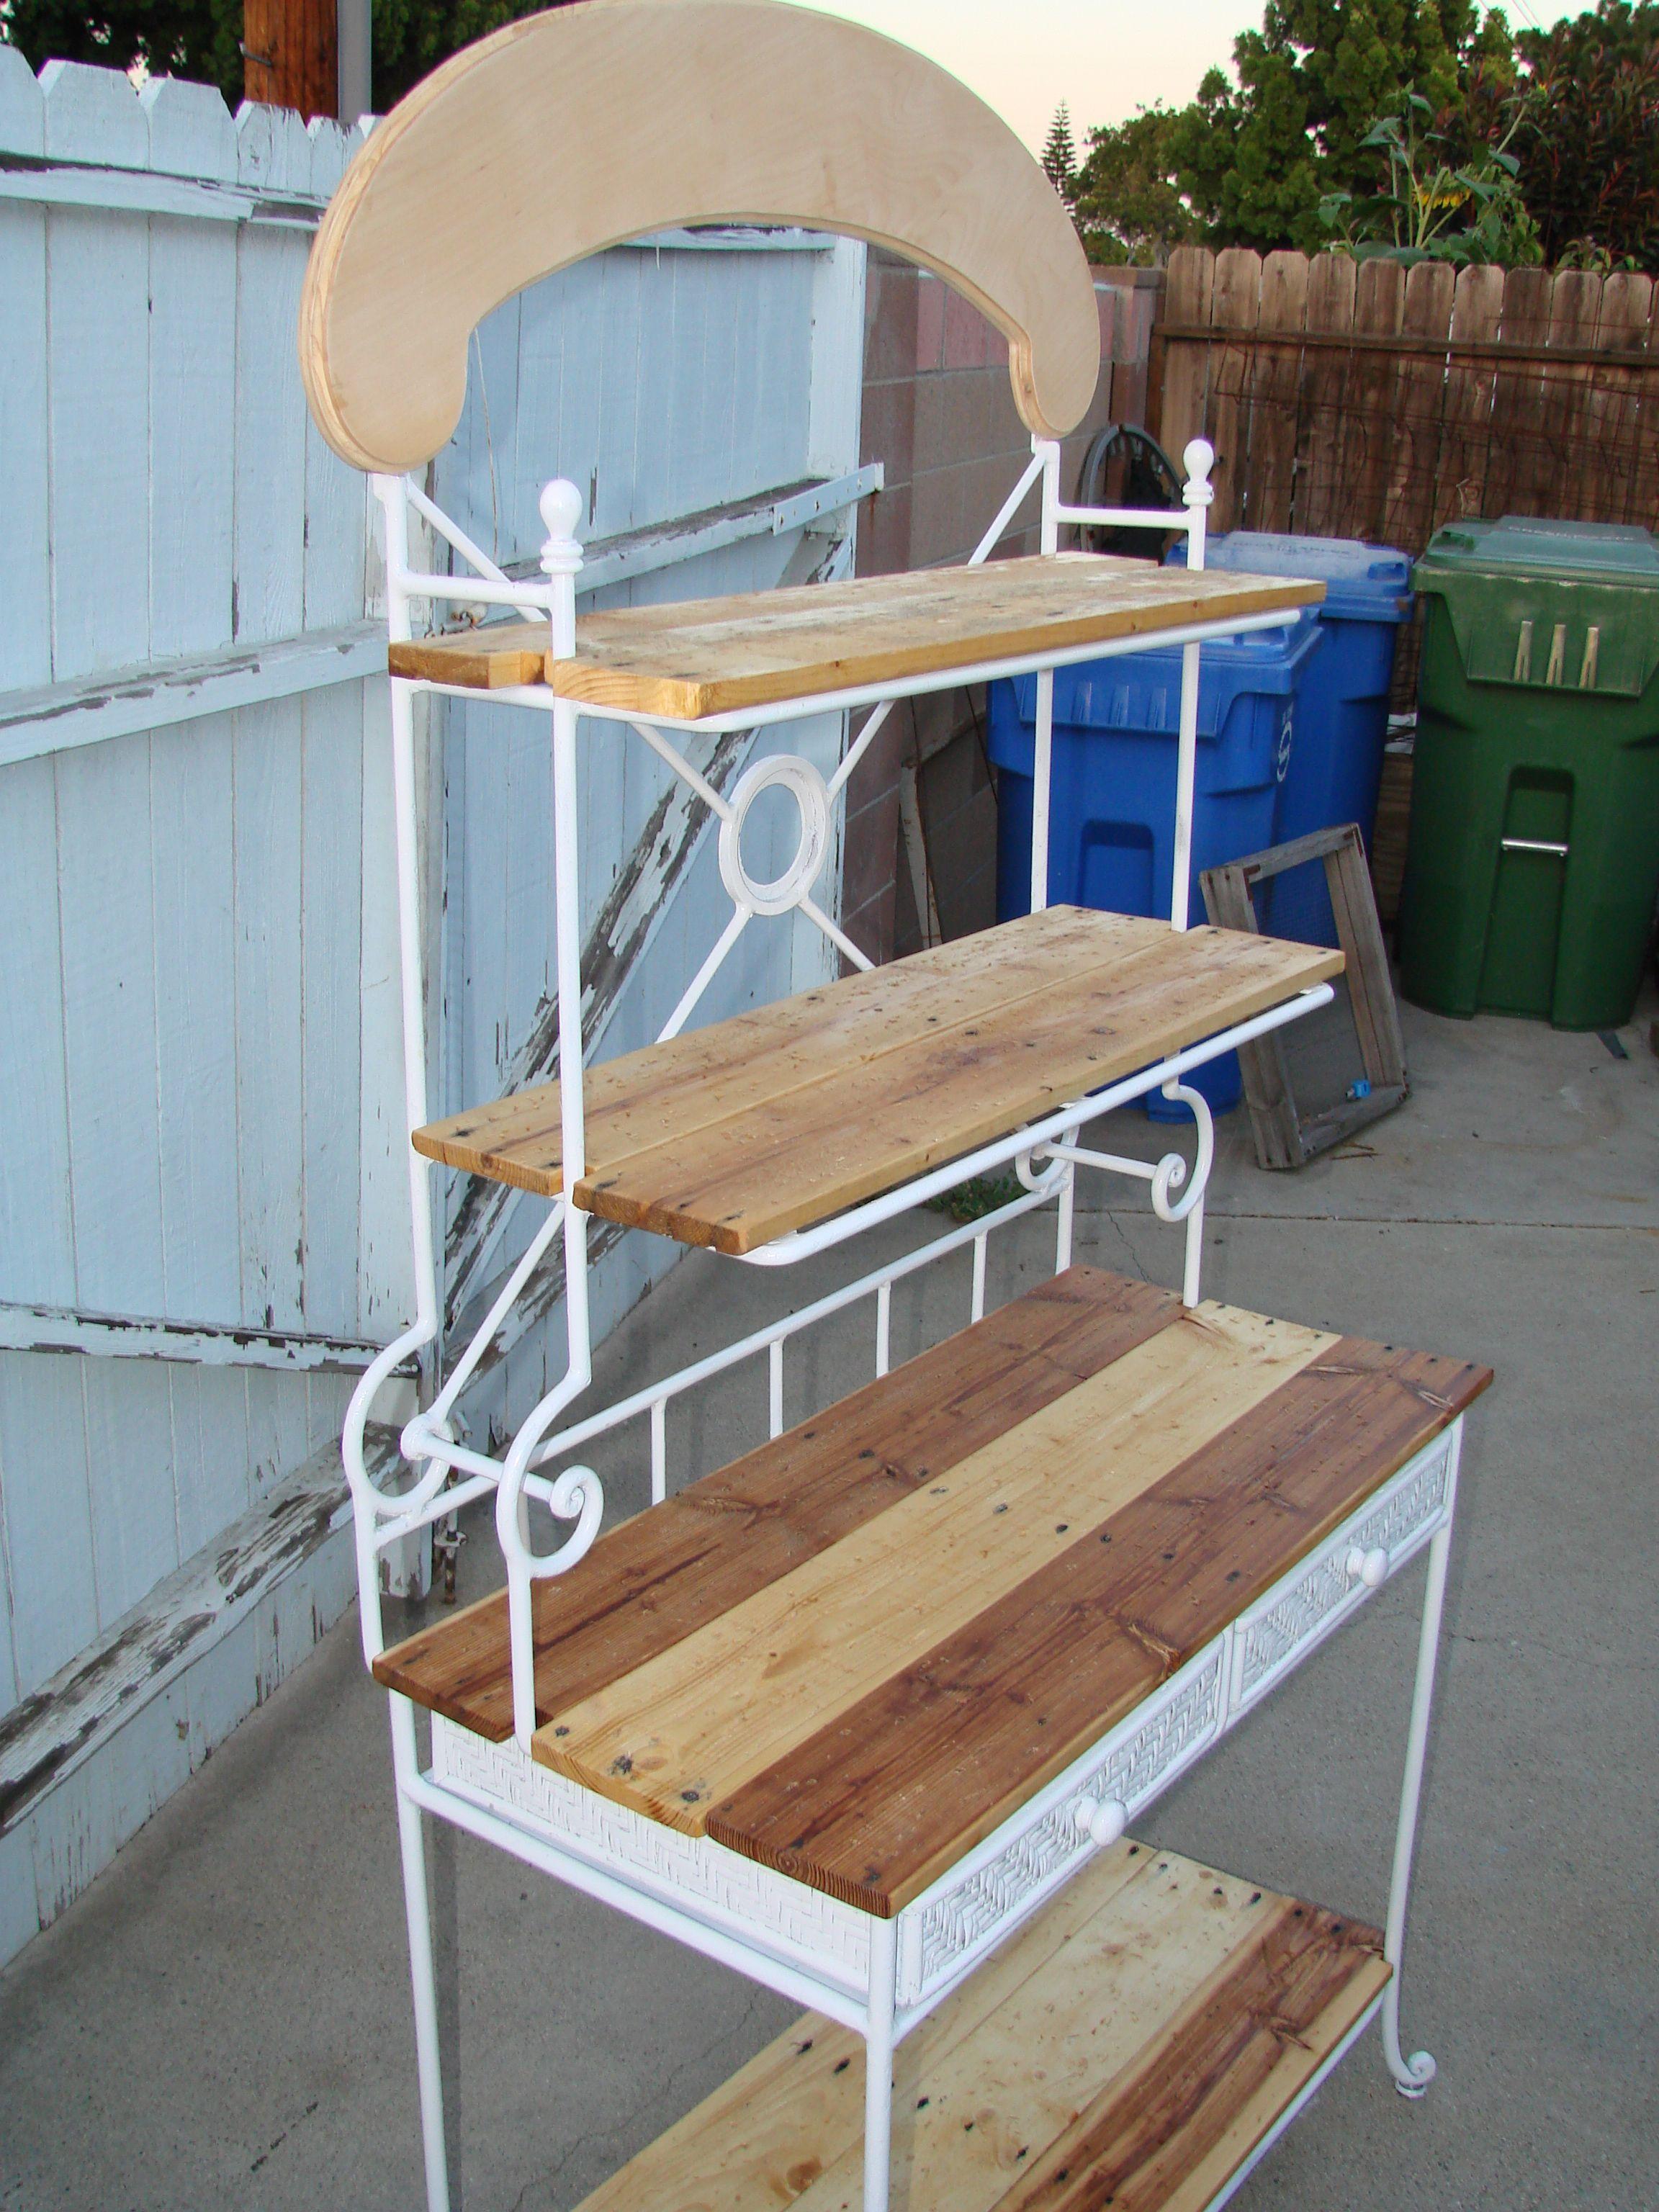 5 00 Yard Sale Bakers Rack Refurbished Using Pallet Wood Shelves